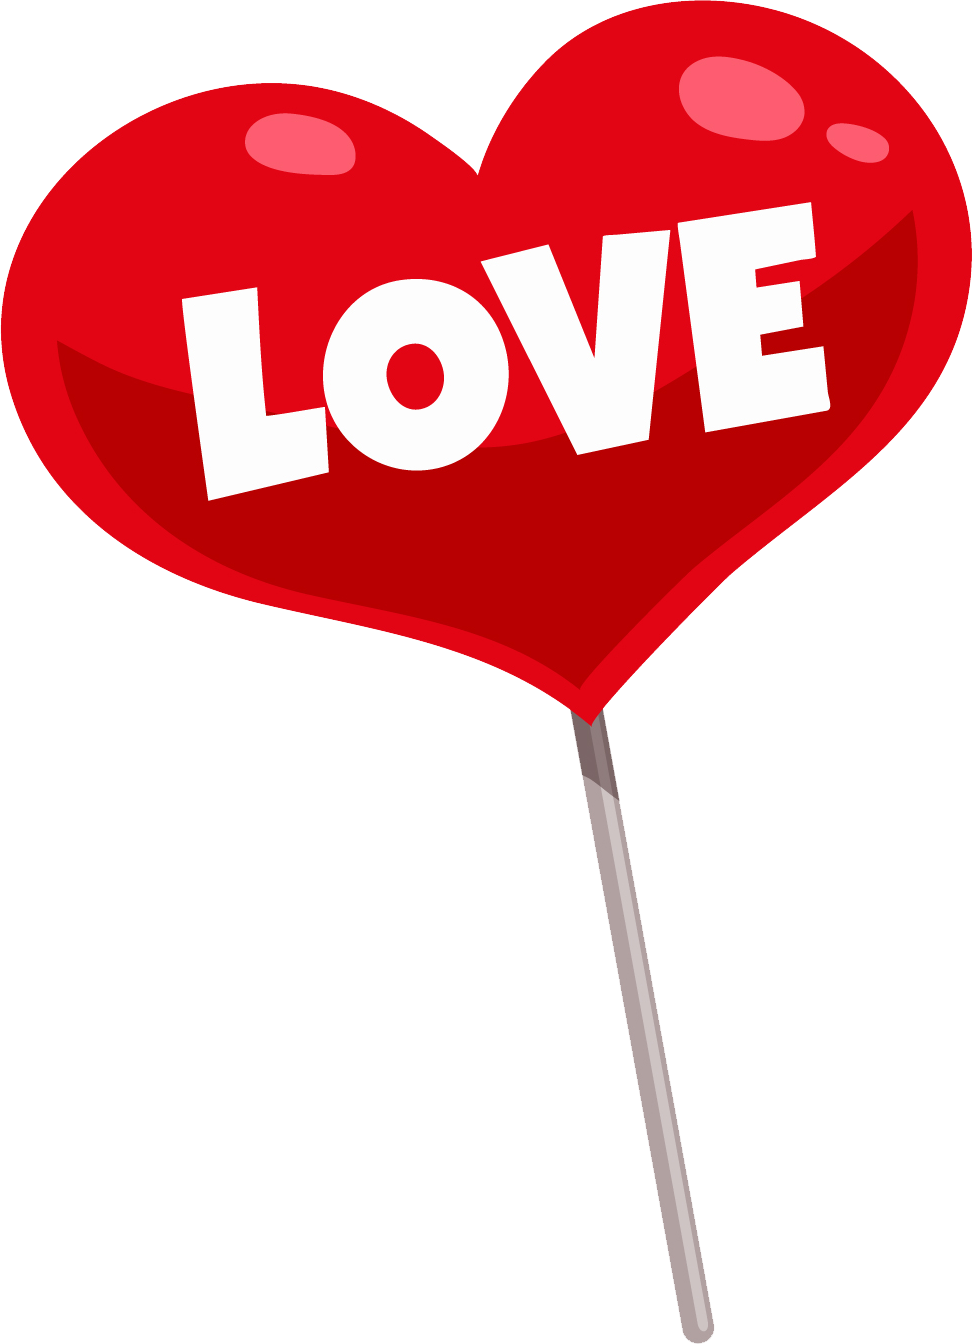 Love Stick